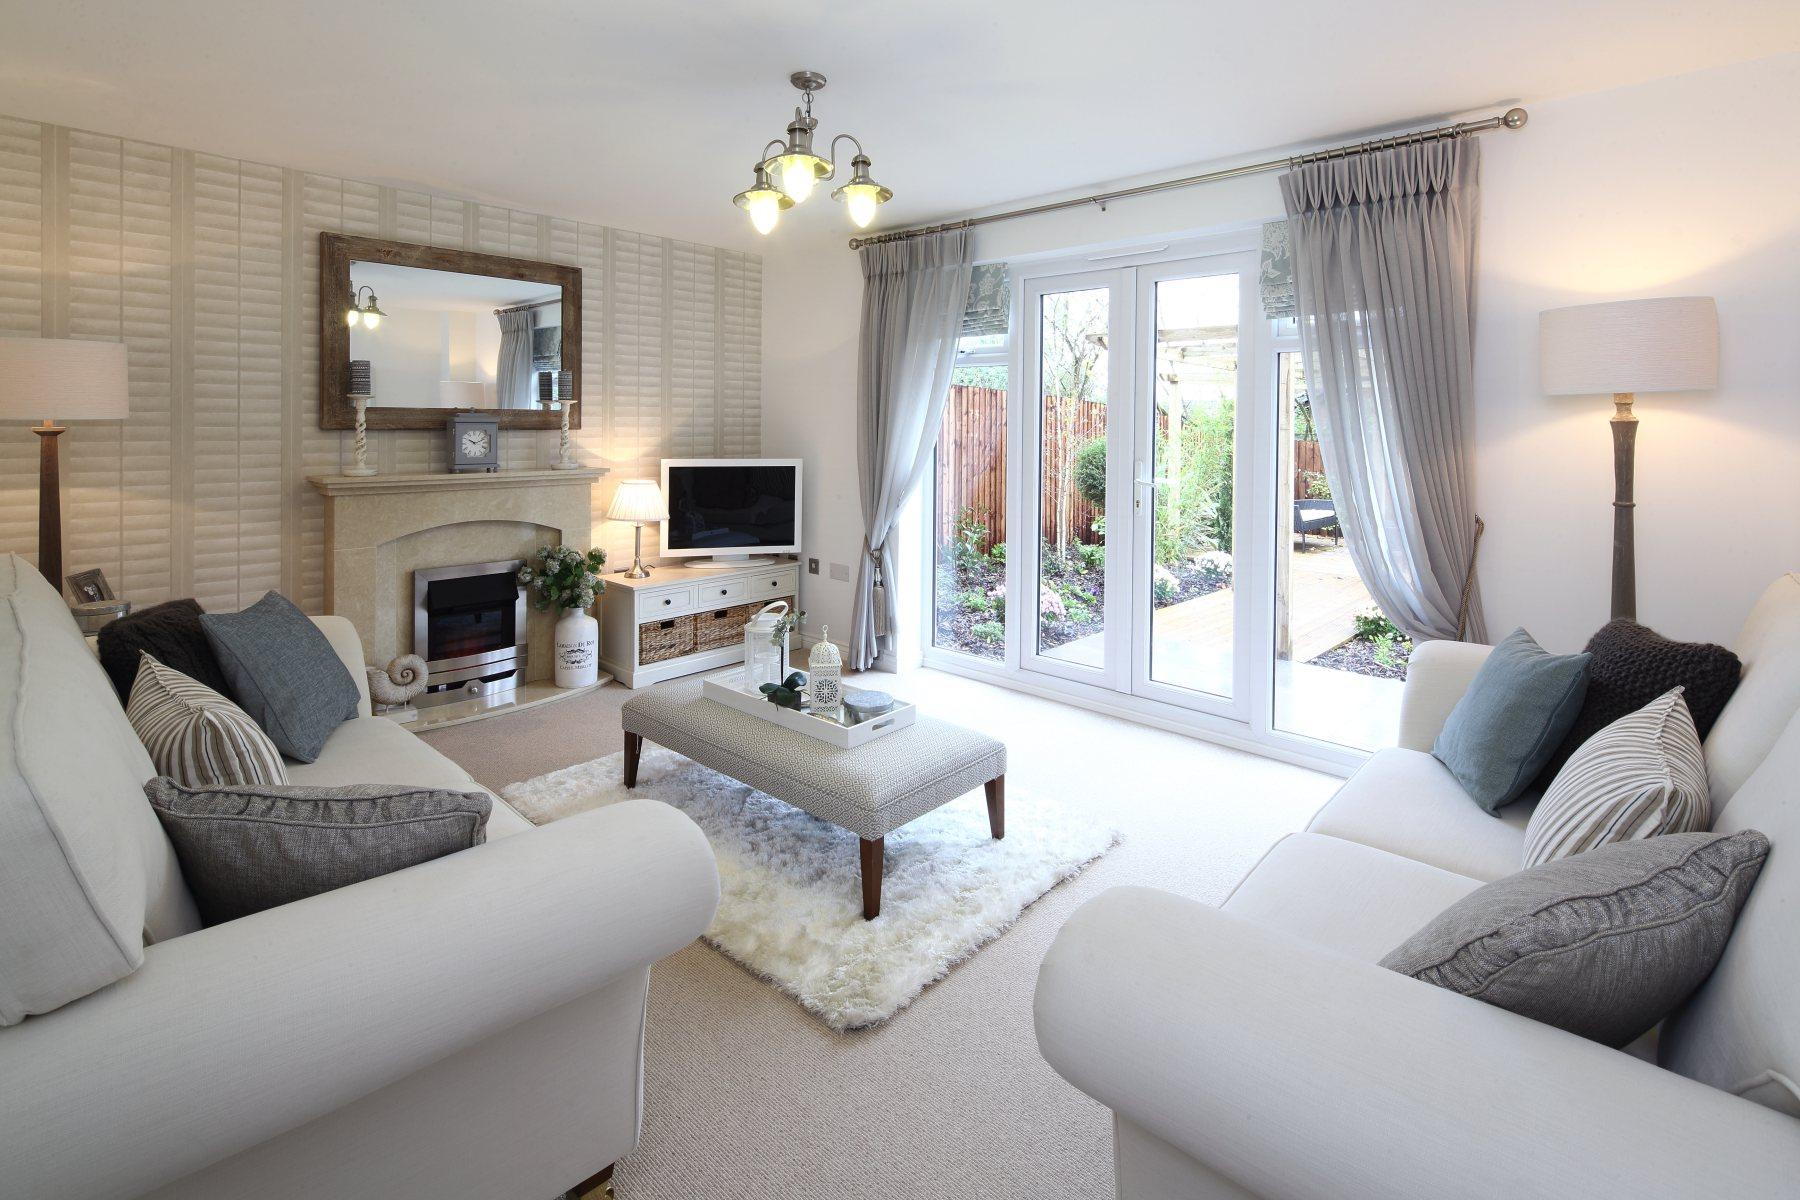 living room show homes best lounge chairs new in farndon taylor wimpey bradenhamtwdcgi6653 bradenham kitchen 2